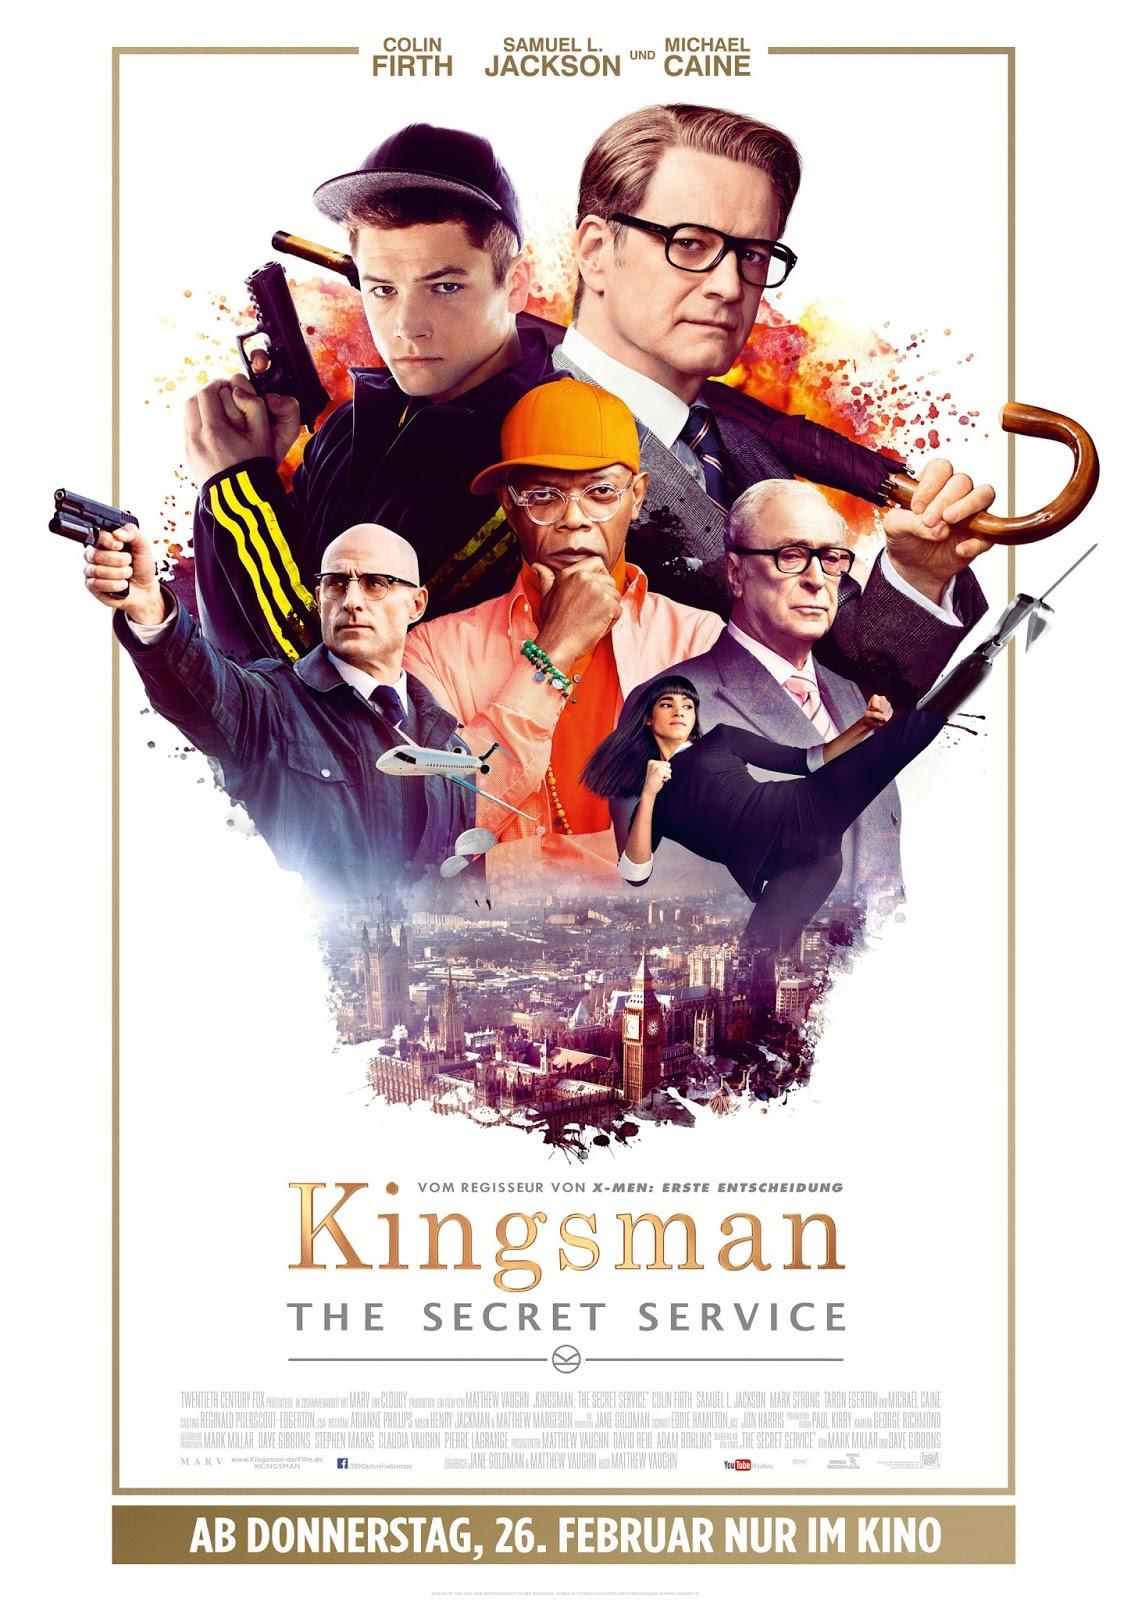 Kingsman Plakat Poster